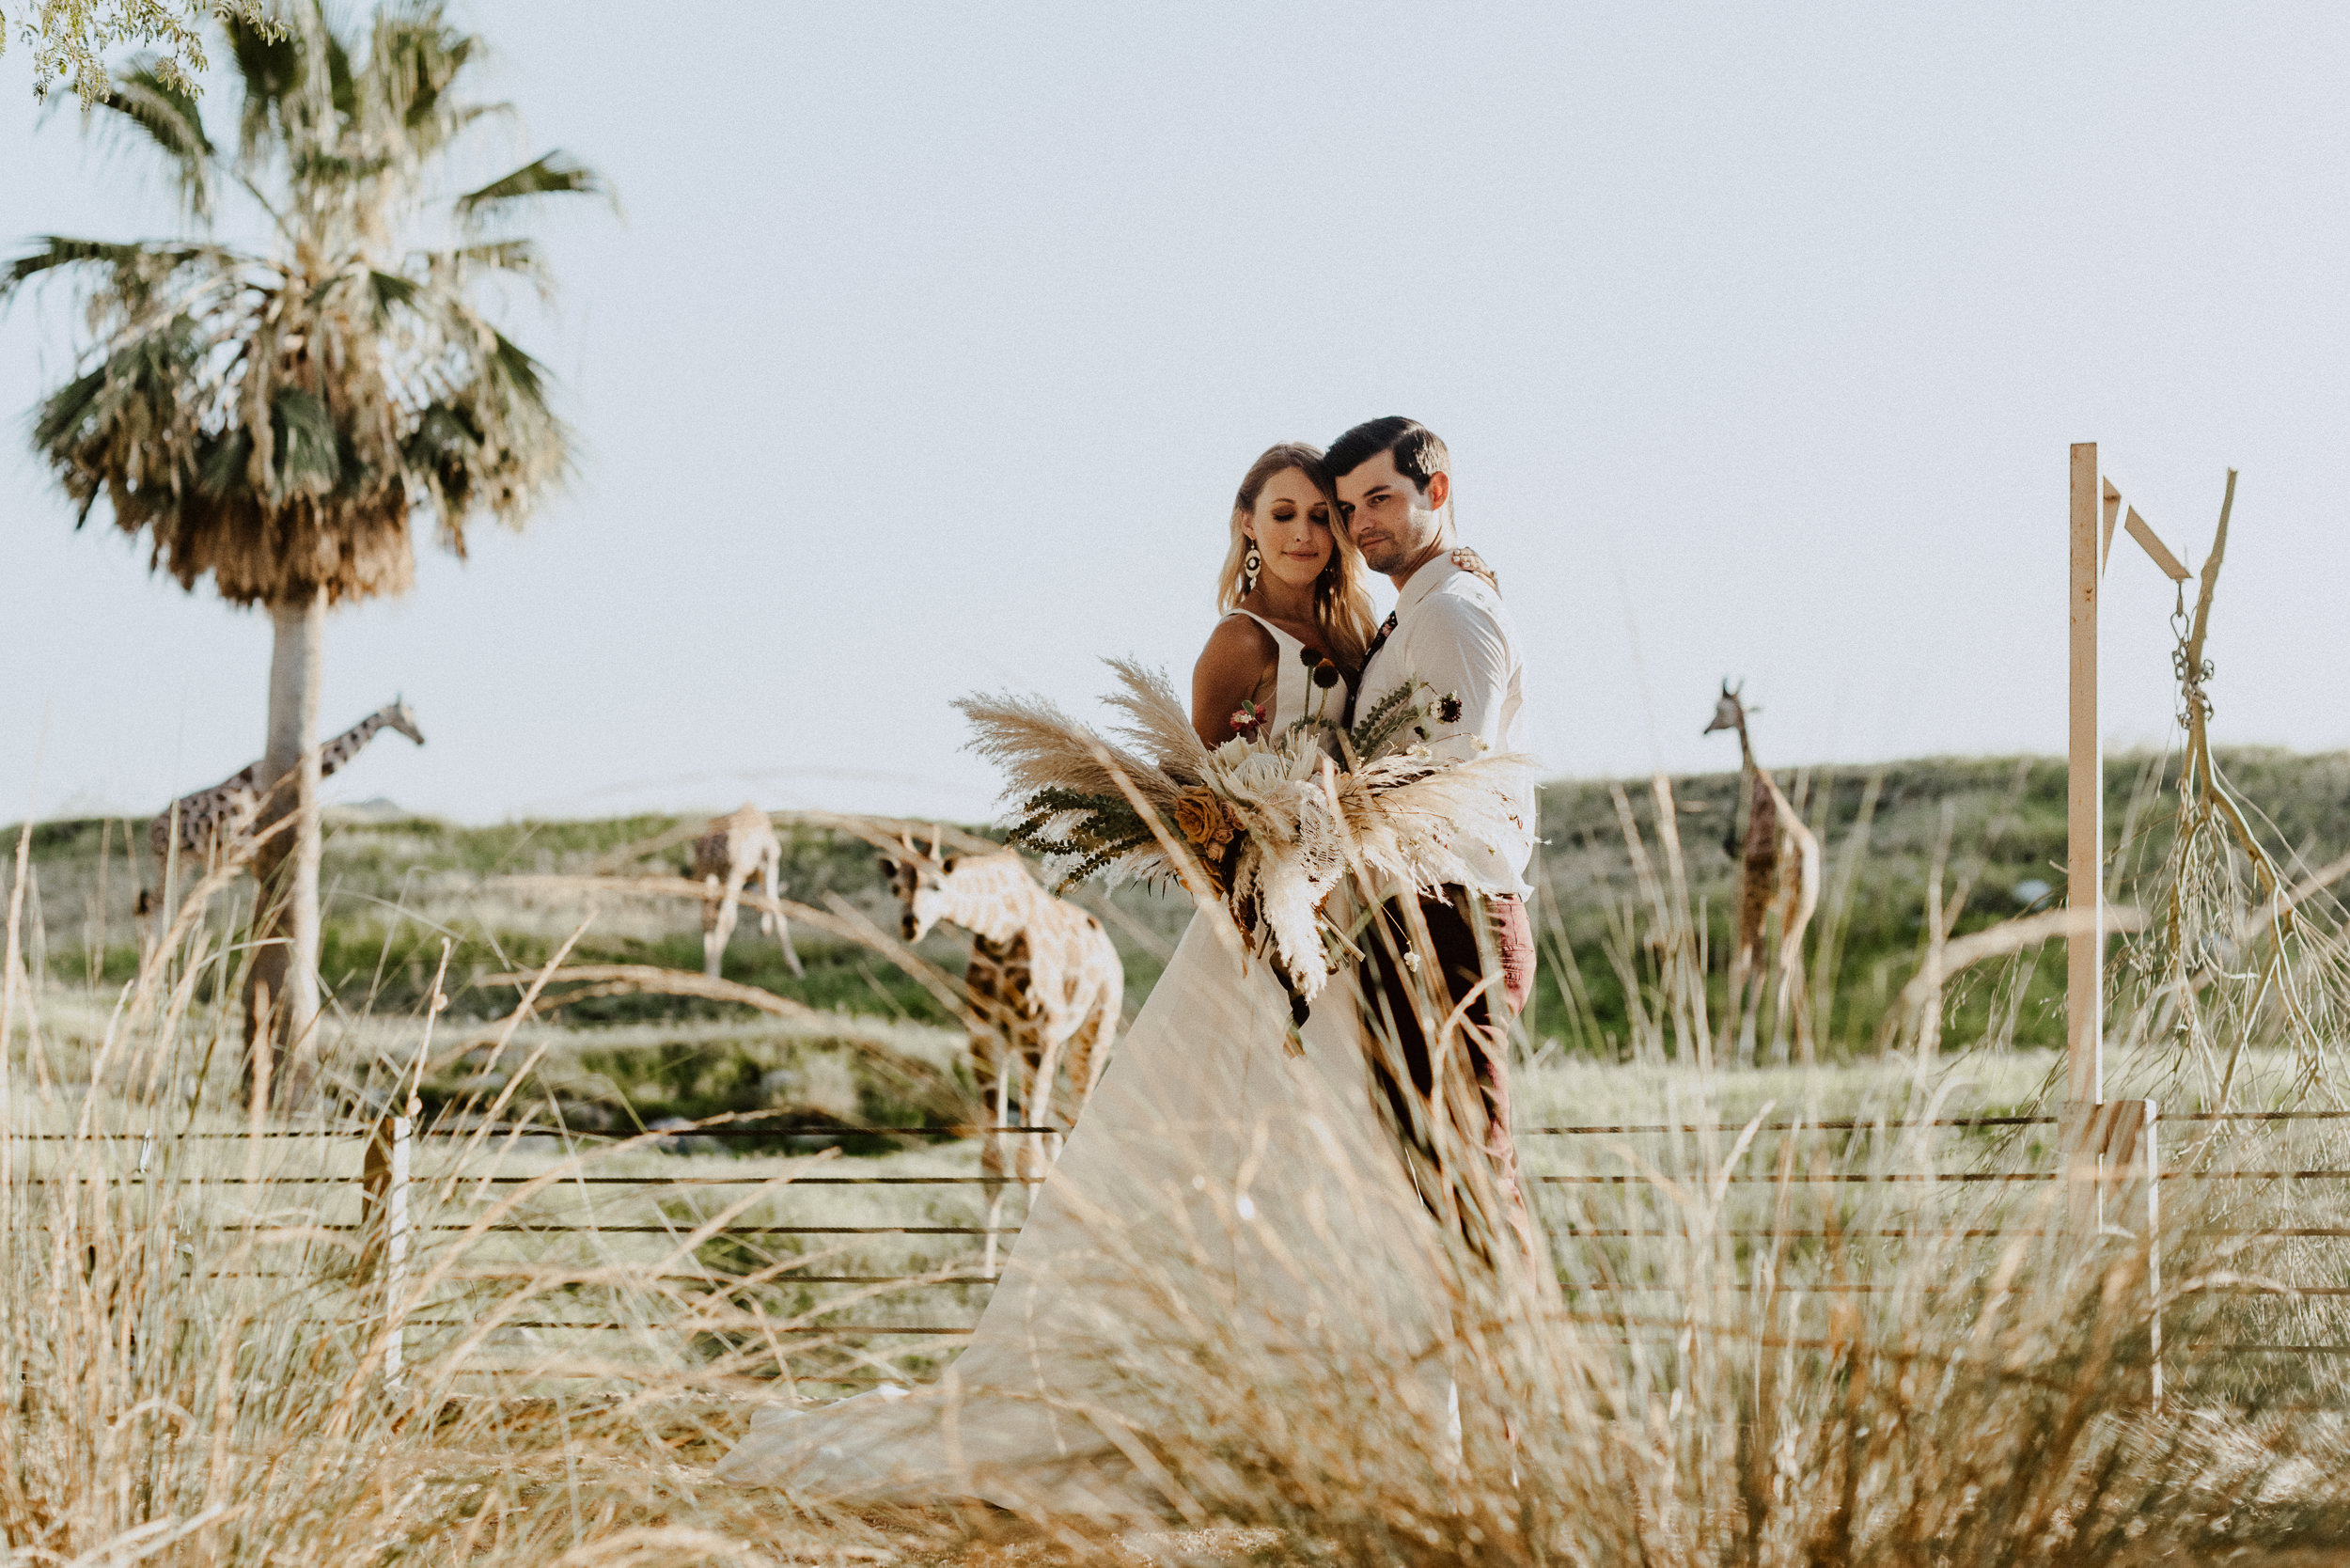 sChelsie + Chris - The Desert Shootout Wedding Romantics at The Living Desert-85.jpg